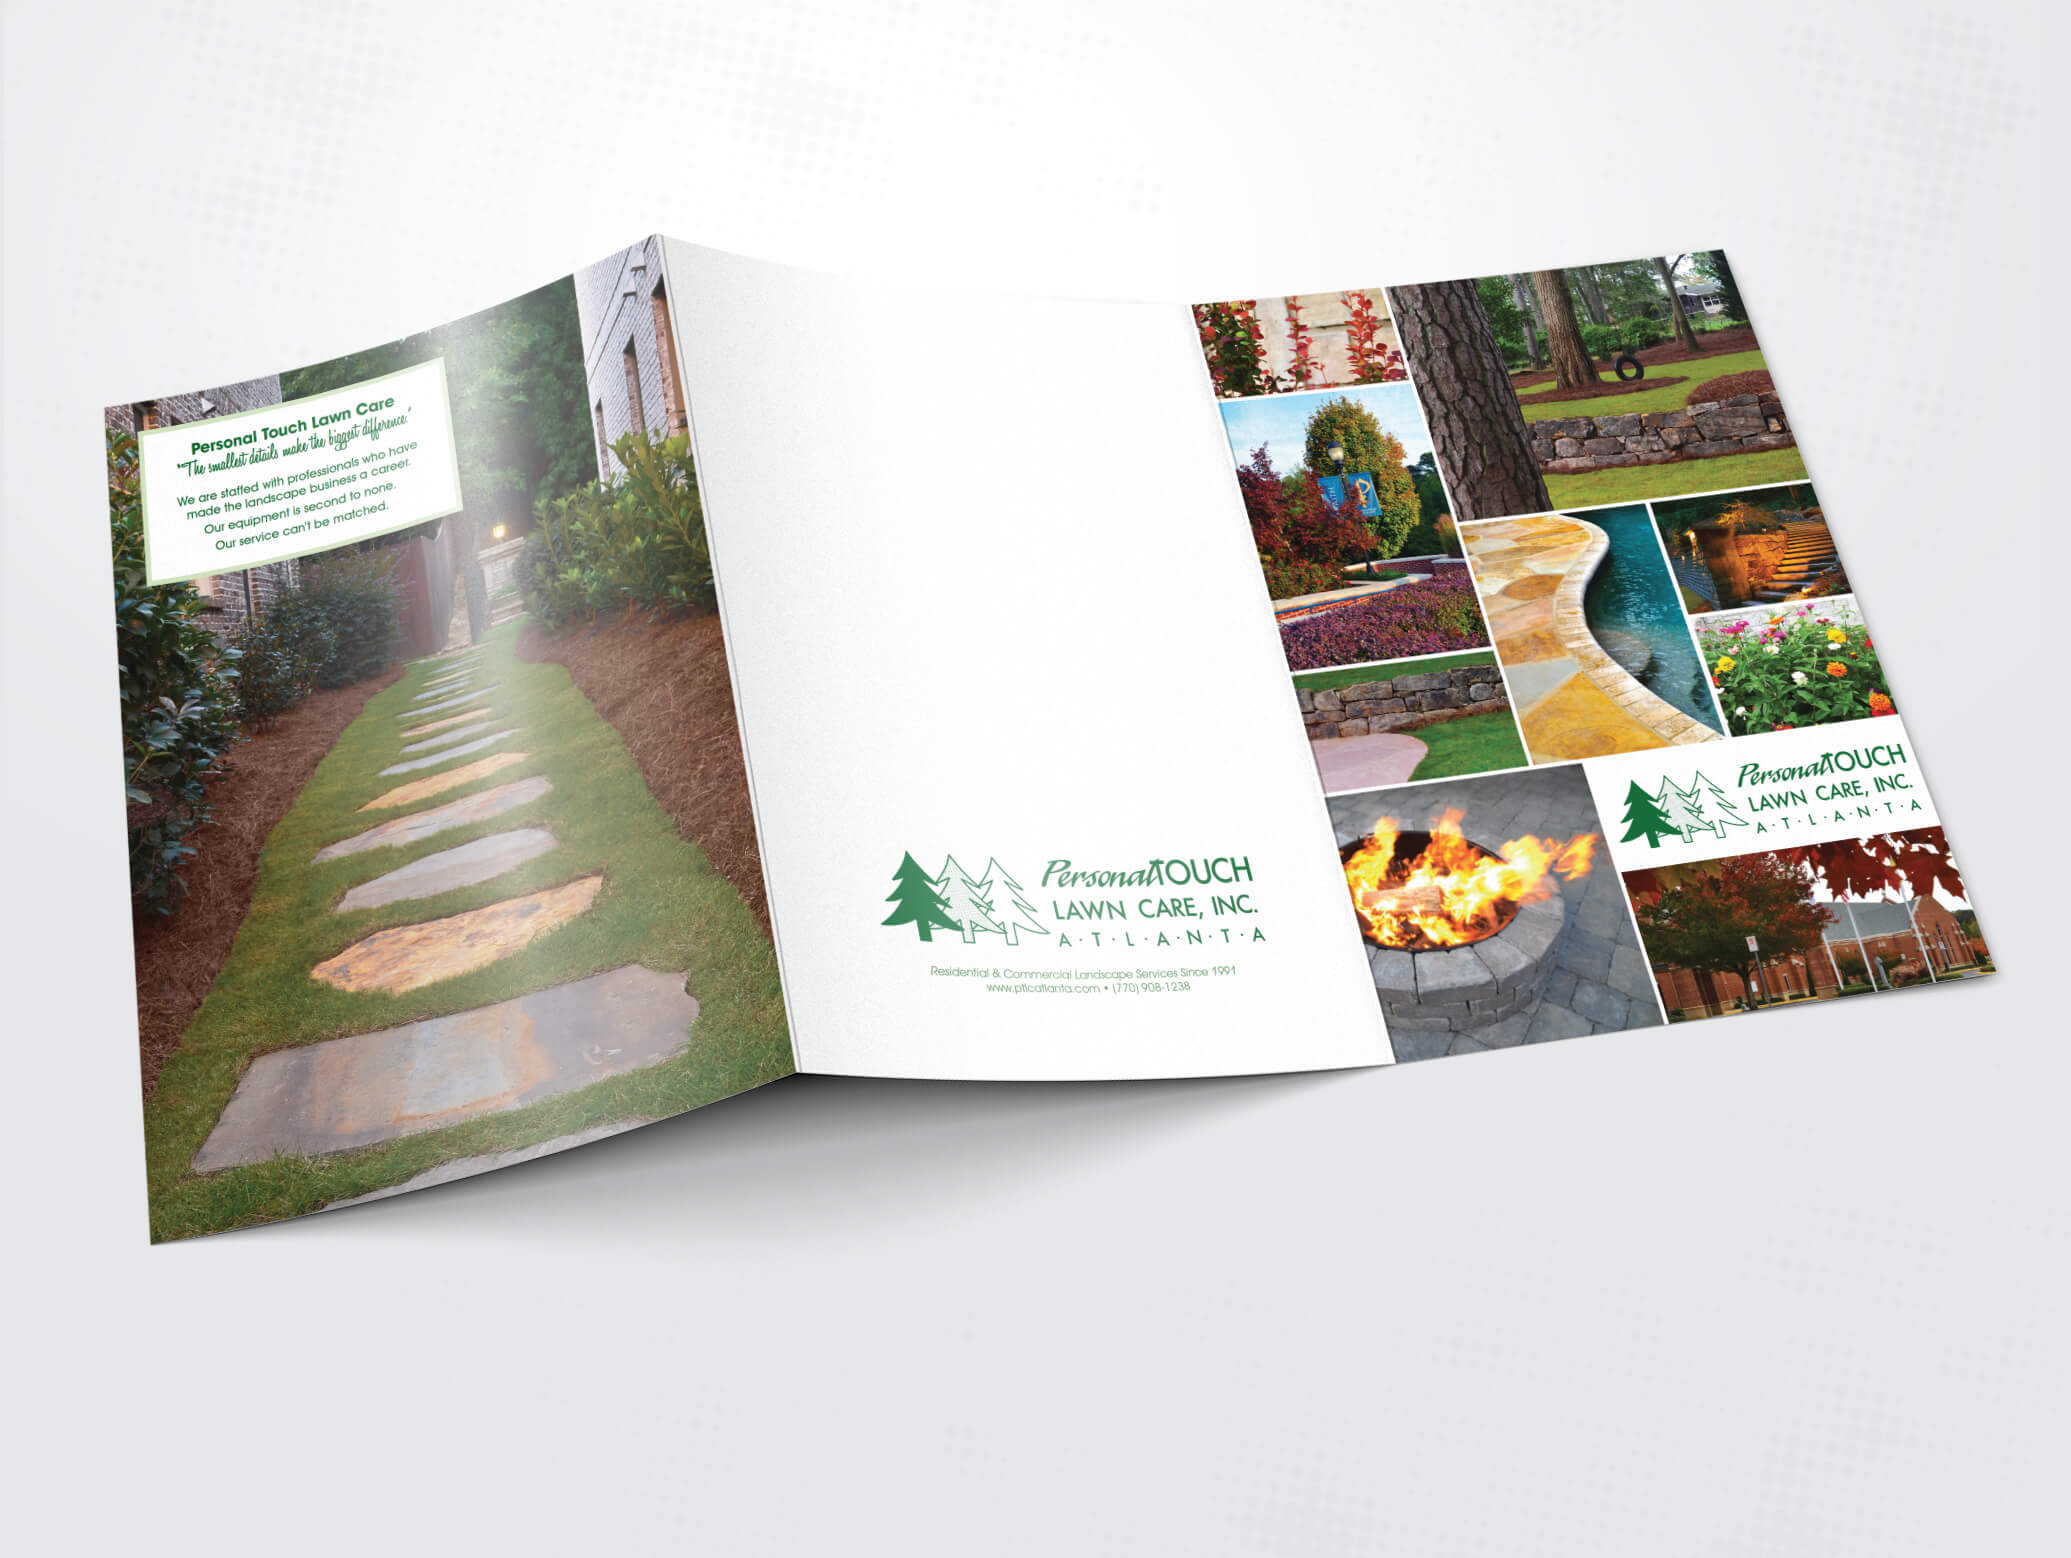 Personal Touch Lawn Care Atlanta brochure